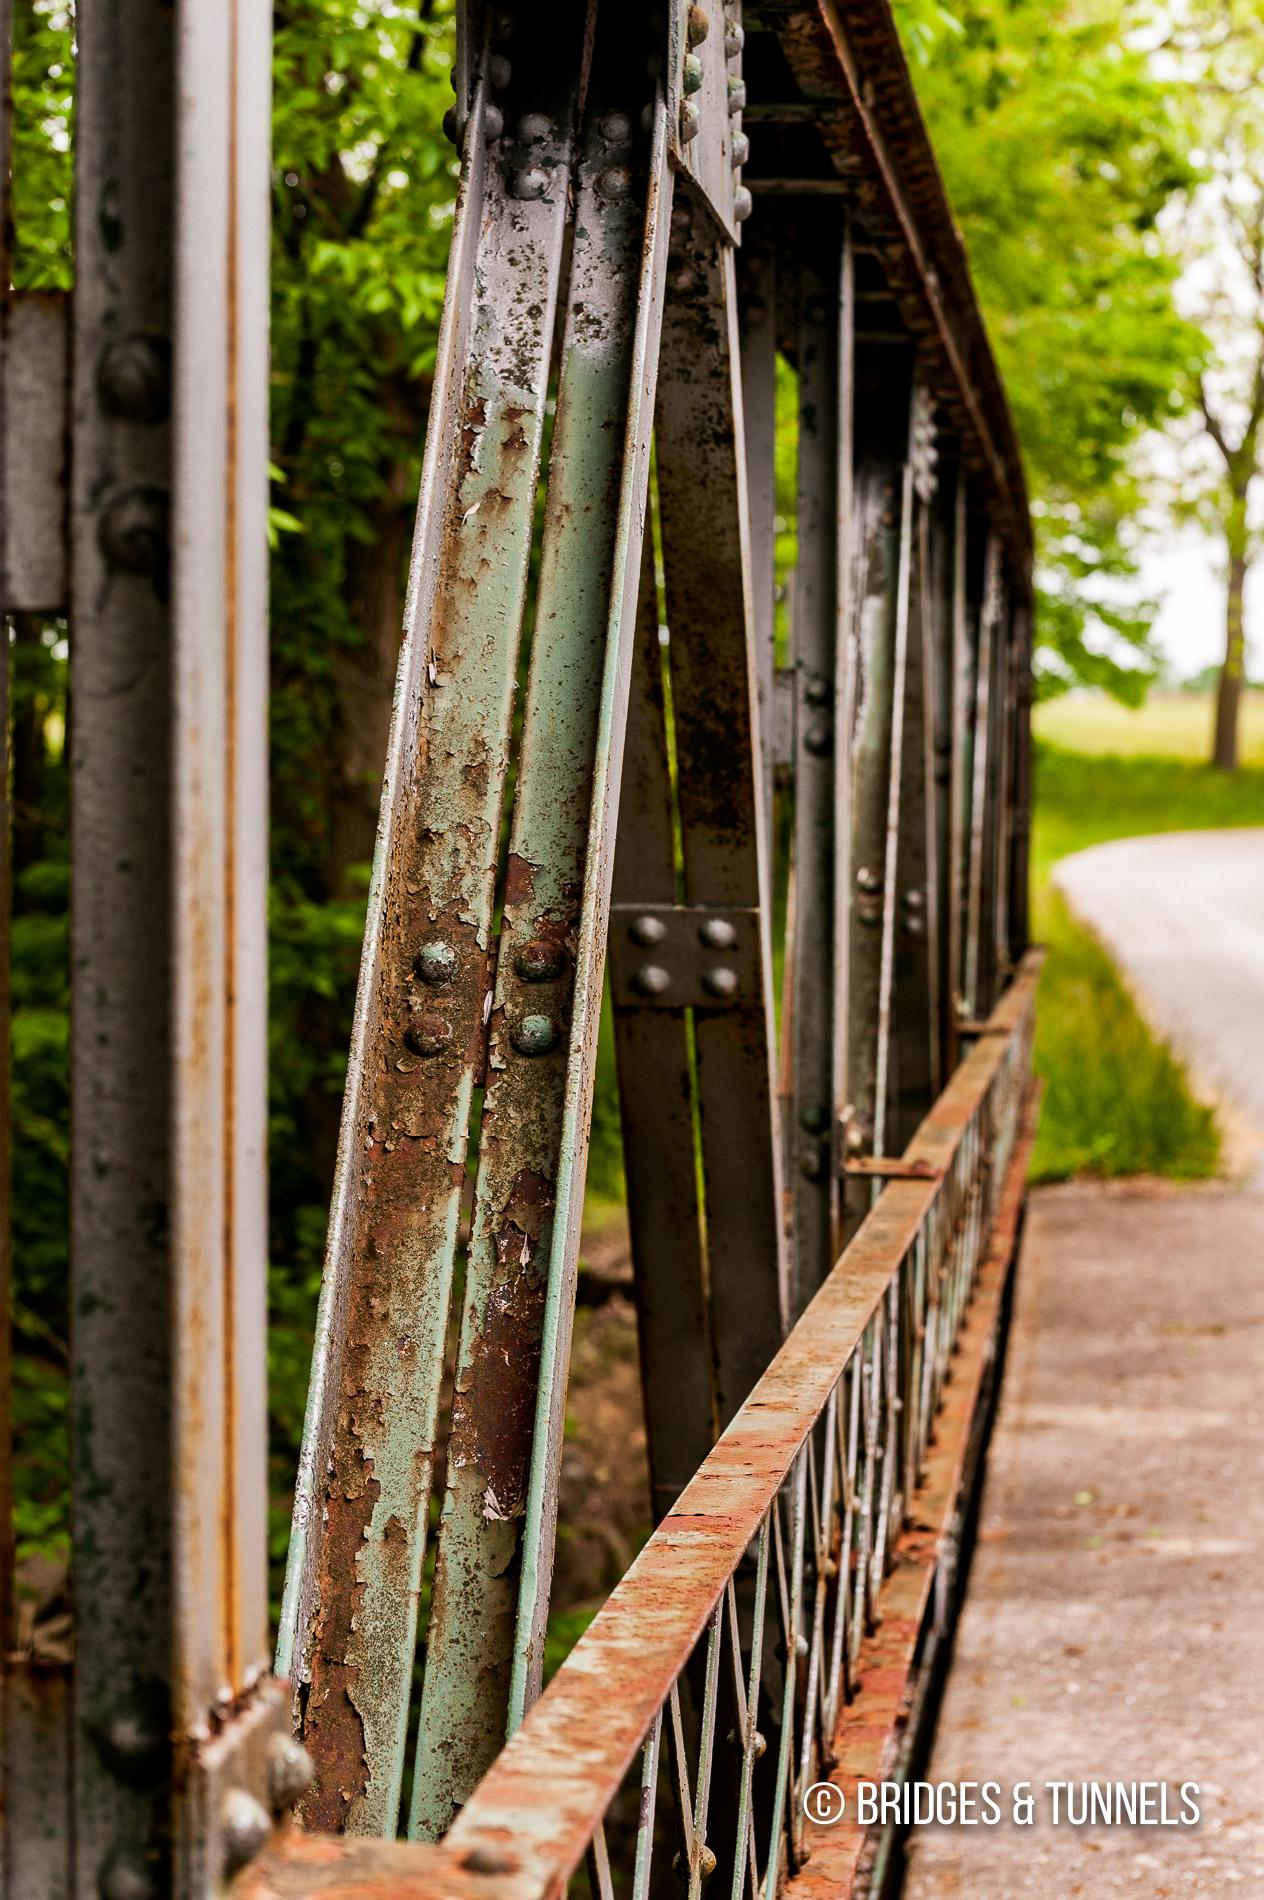 Monebrake Road Bridge